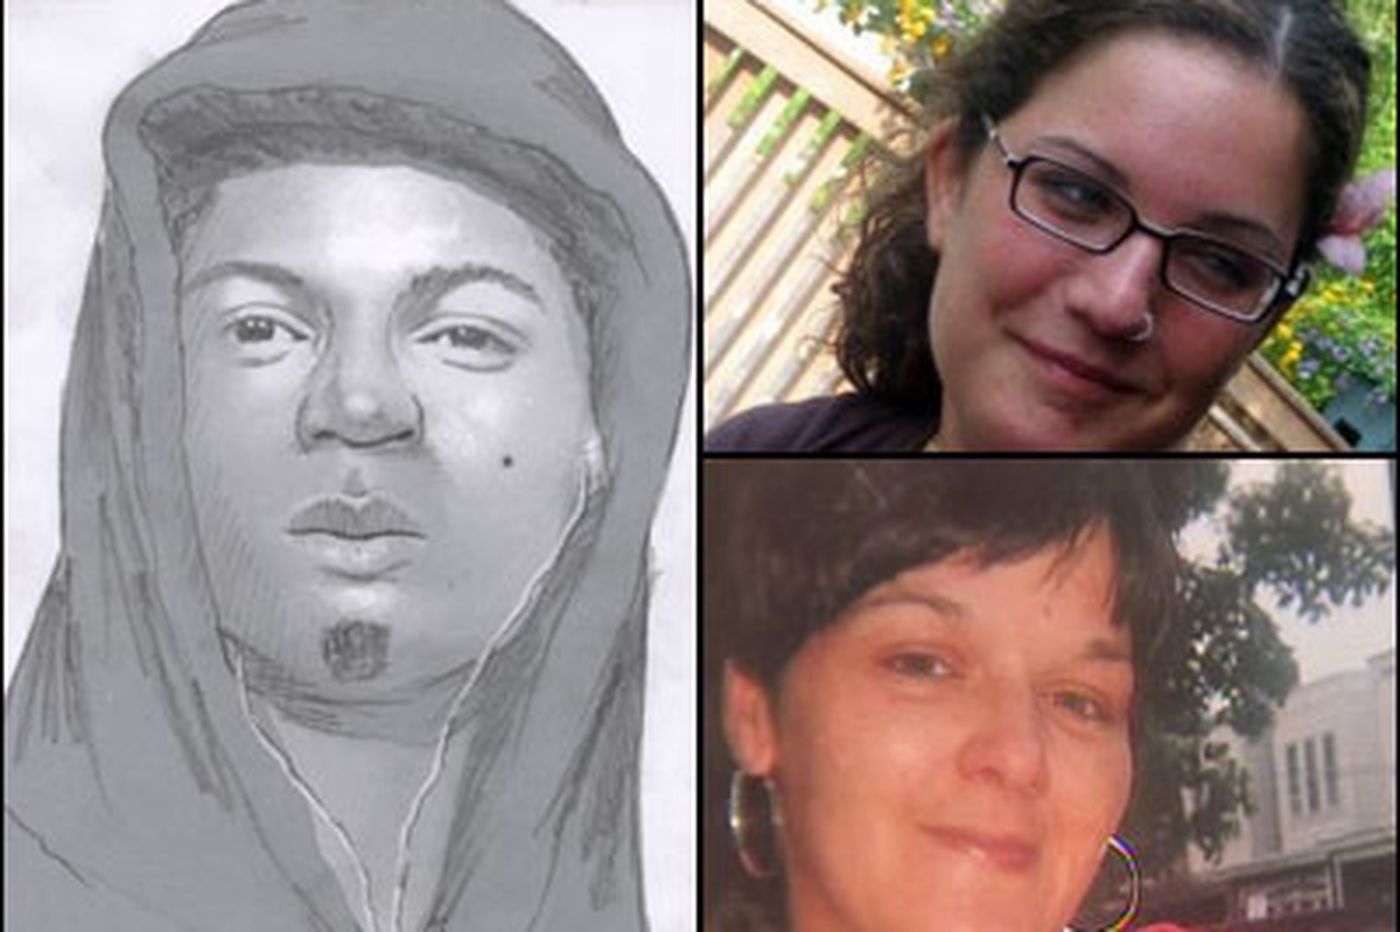 Surviving Kensington strangler victim gives cops his description